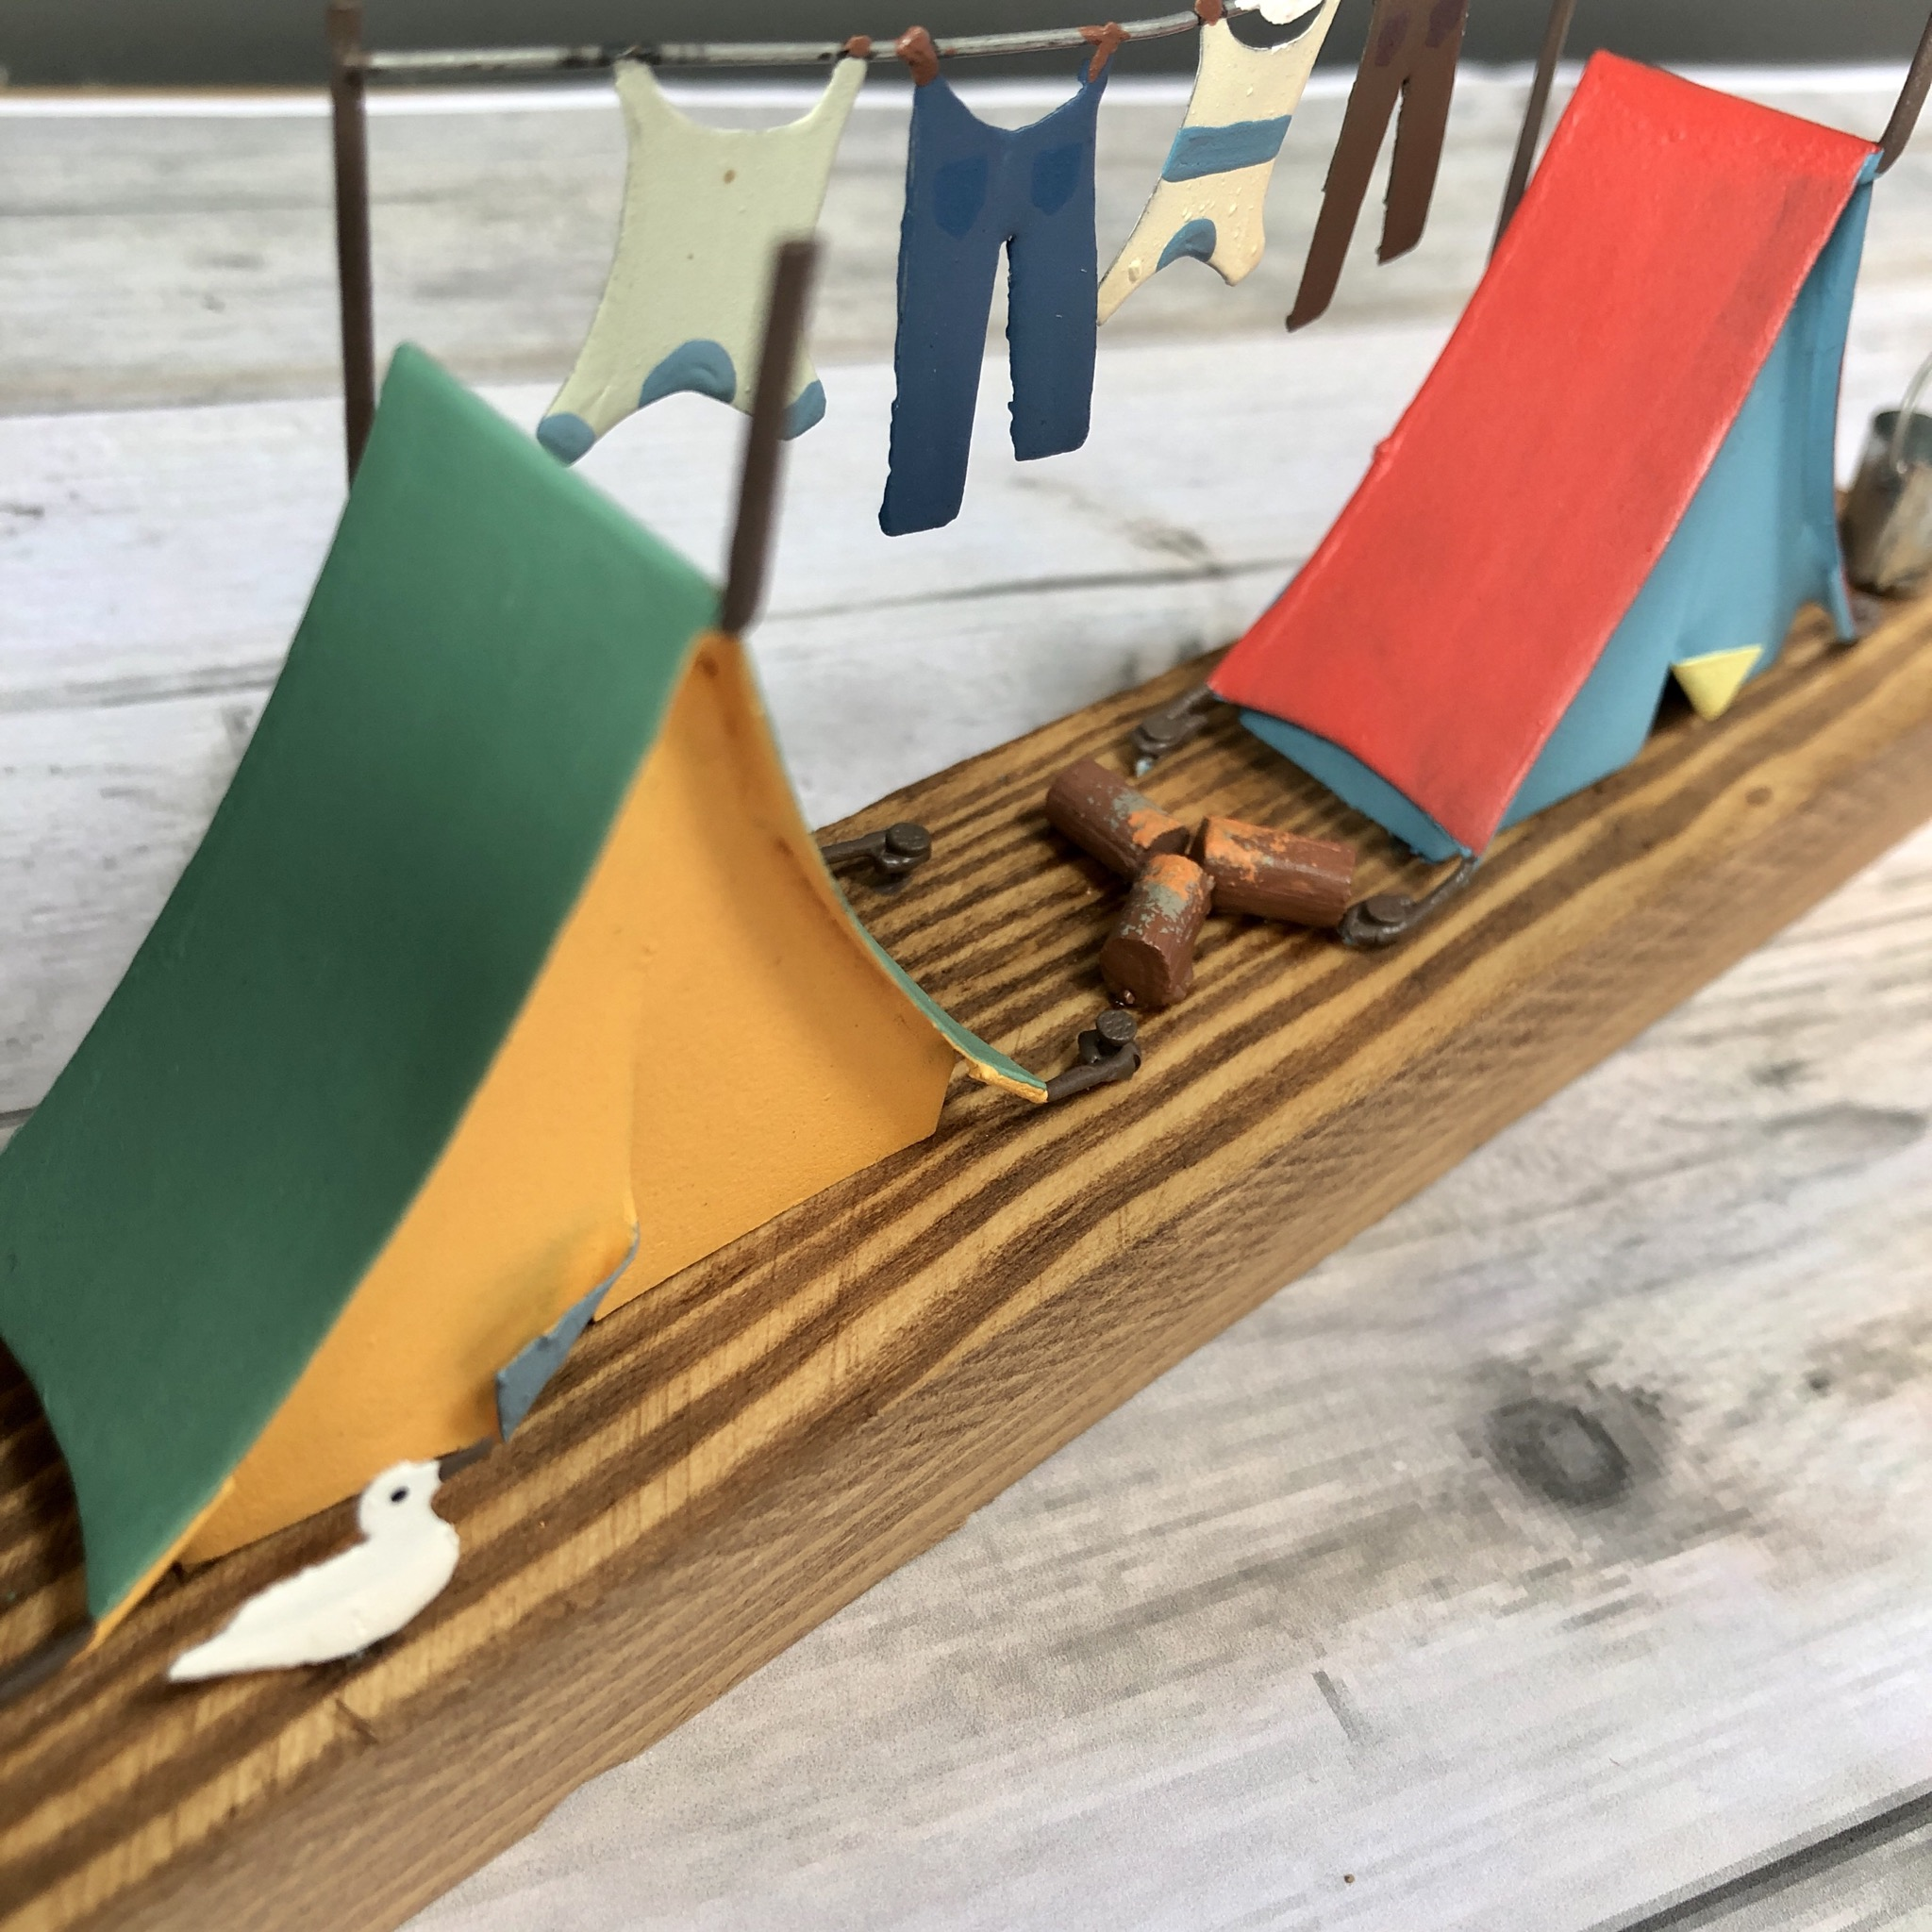 Retro tents campsite life  ornament by shoeless joe.